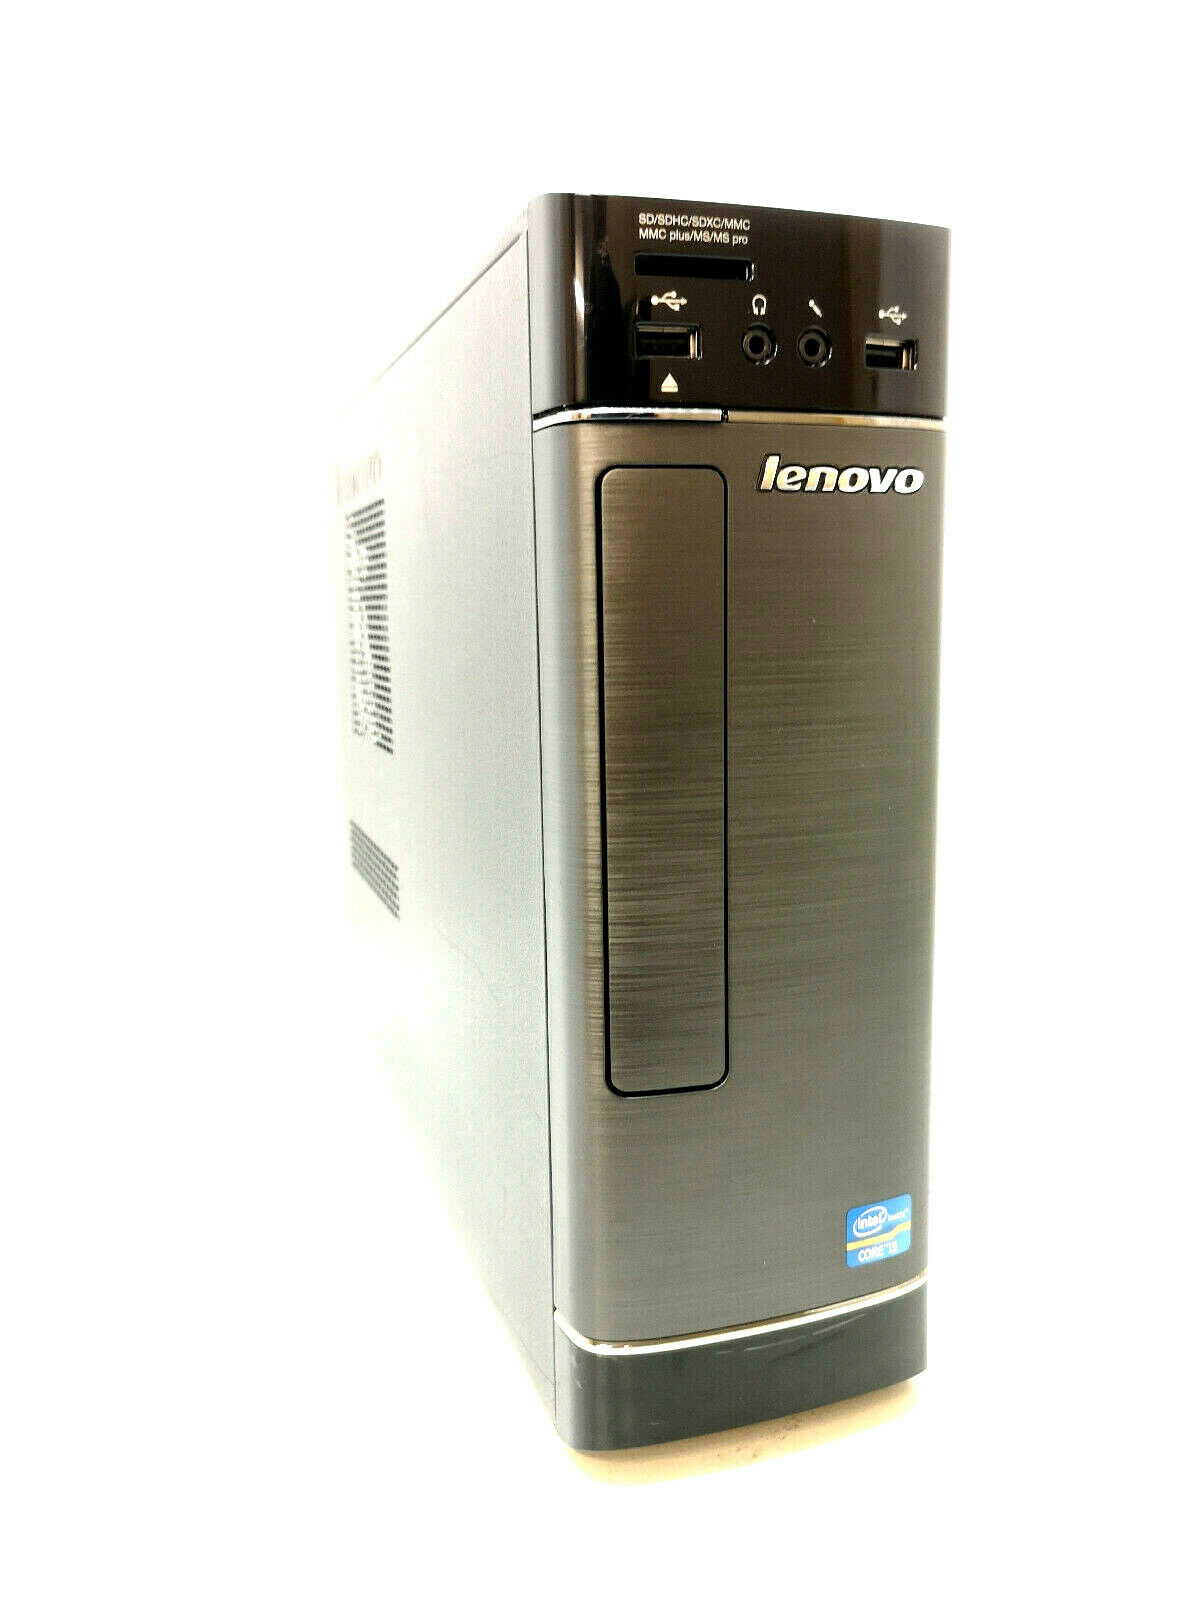 Lenovo-H520s - 145966